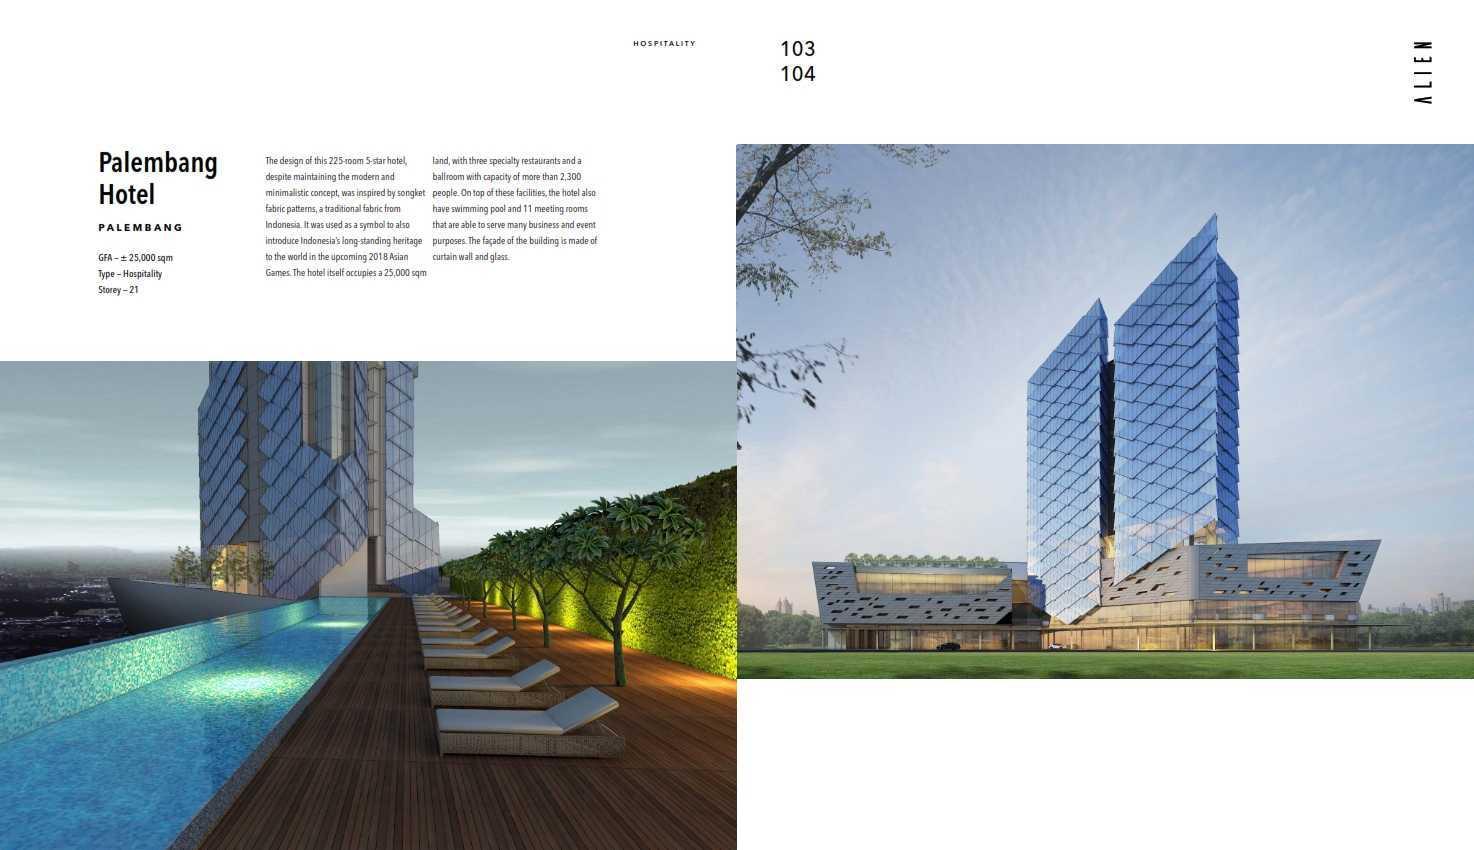 Alien Design Consultant Alien Dc Hotels & Resort Porto Palembang Palembang Aliencompro260Mmx300Mm12Updated052  44719